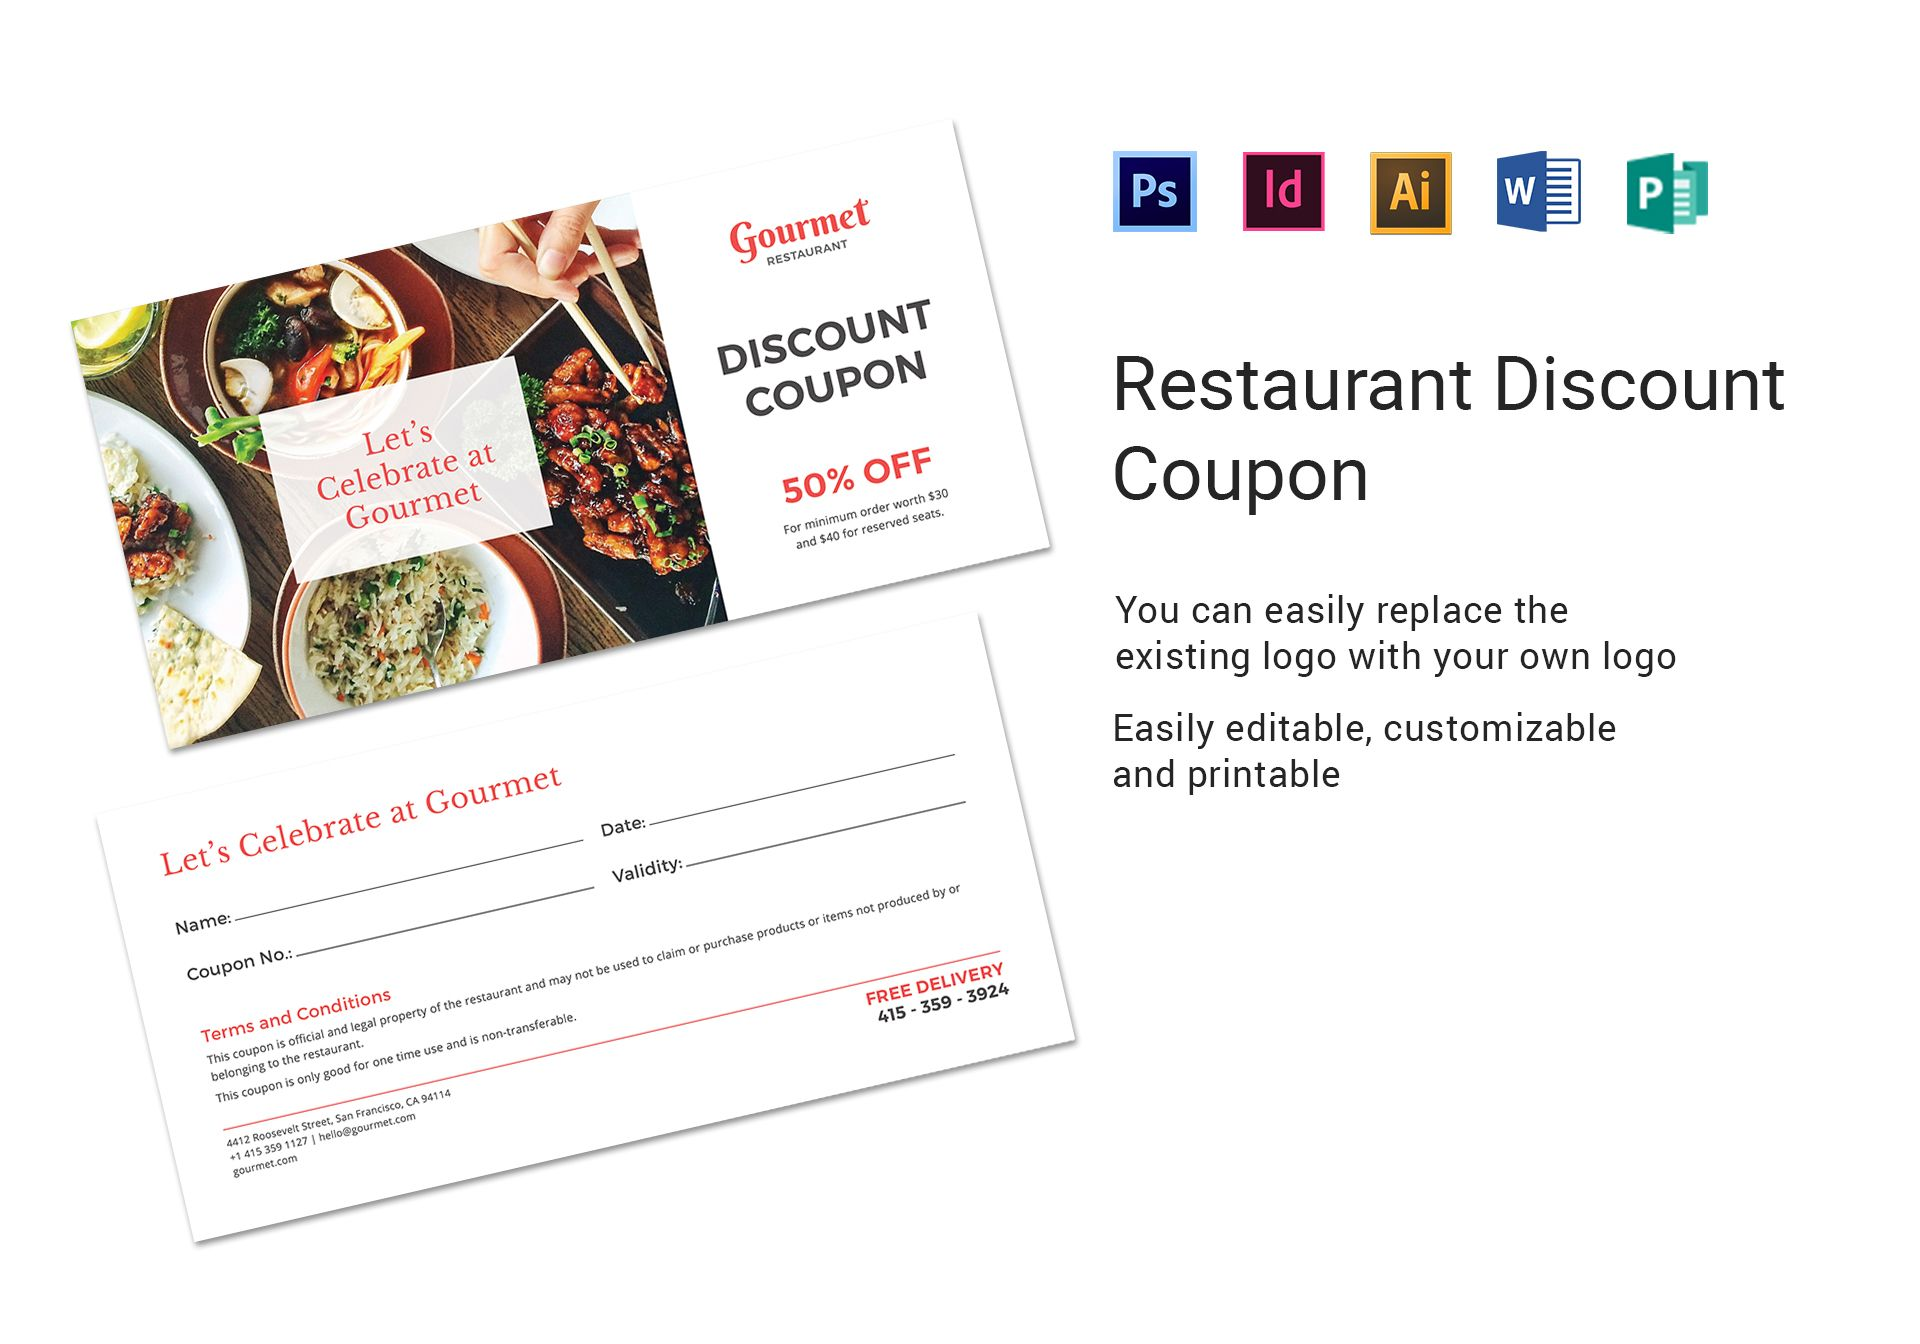 Restaurant Discount Coupon